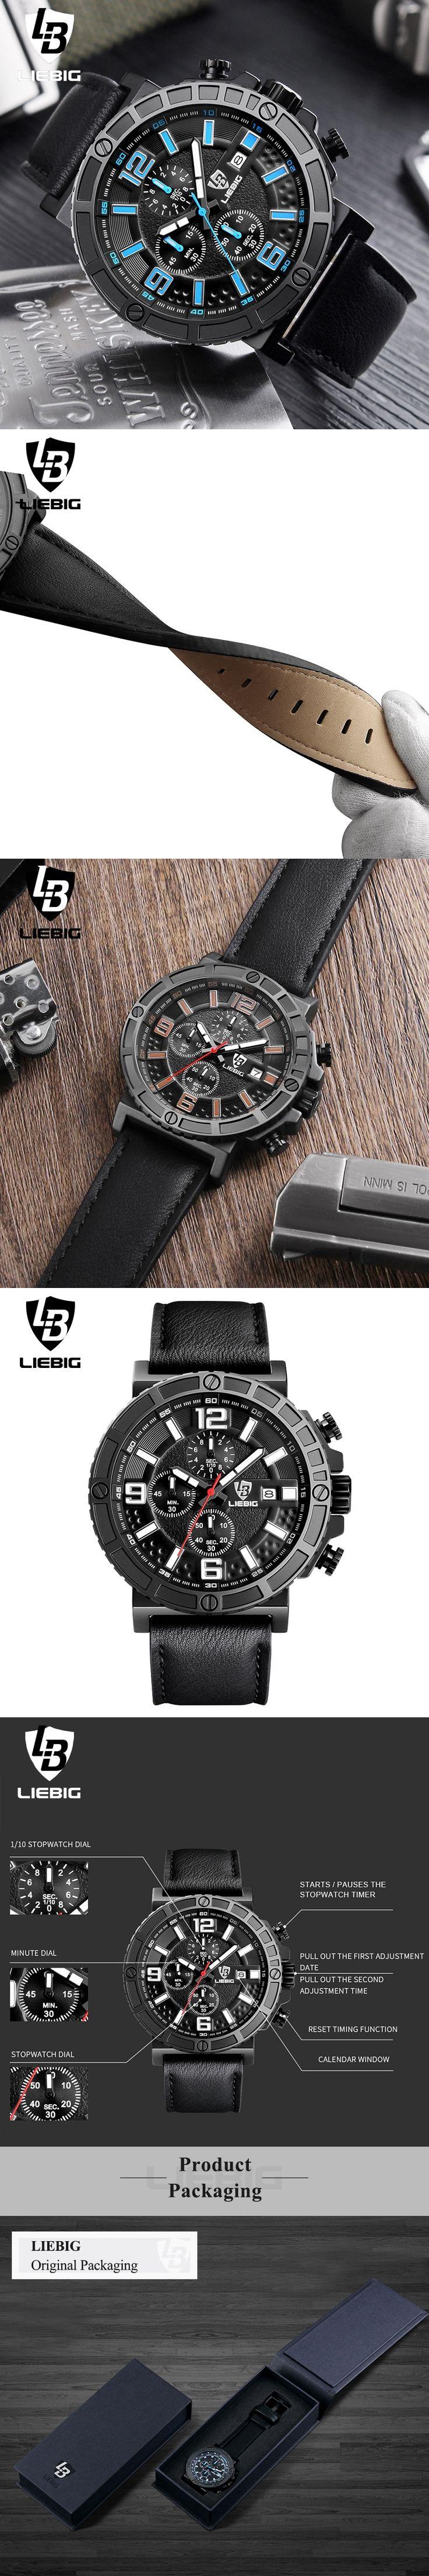 Luxury Top Brand Fashion Men's Quartz Watch Military Waterproof Watches Sport Stopwatch Watch Men Clock Relogio Masculino Xfcs